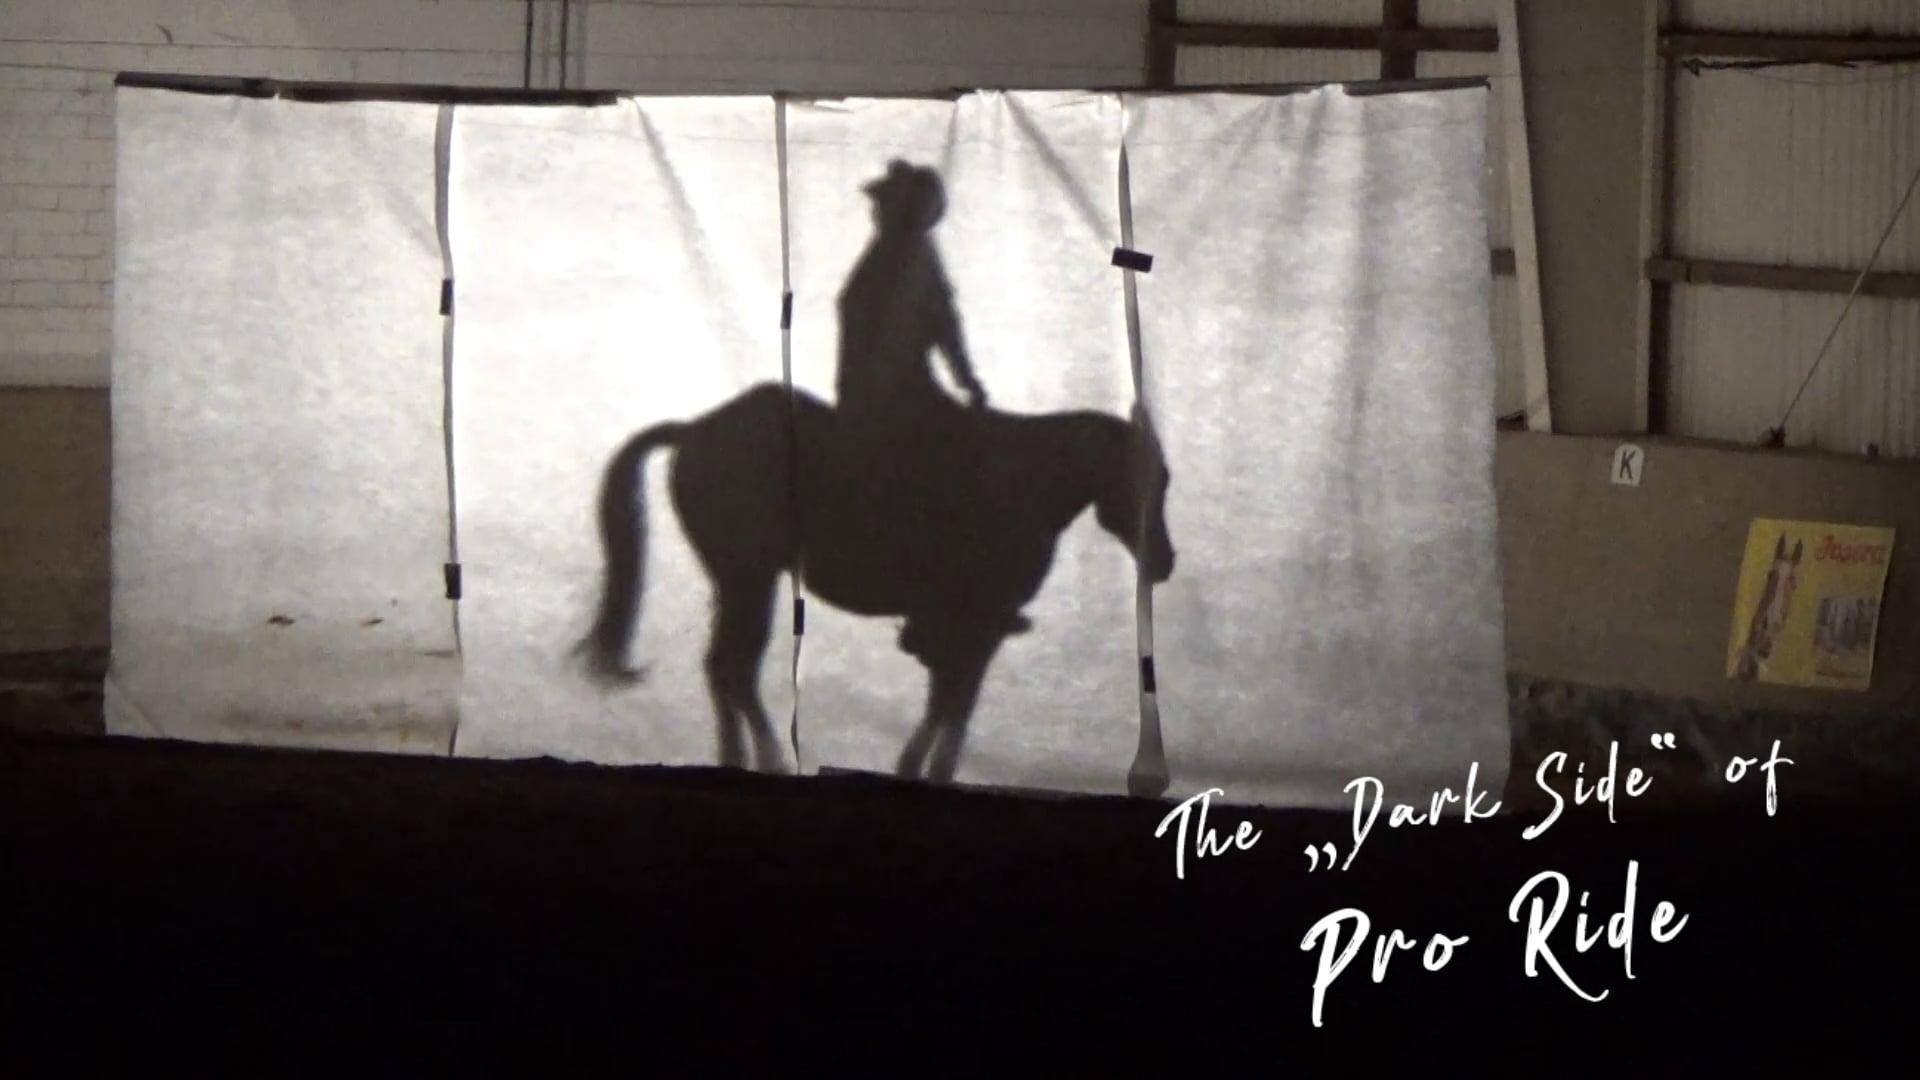 Dark Side of Pro Ride